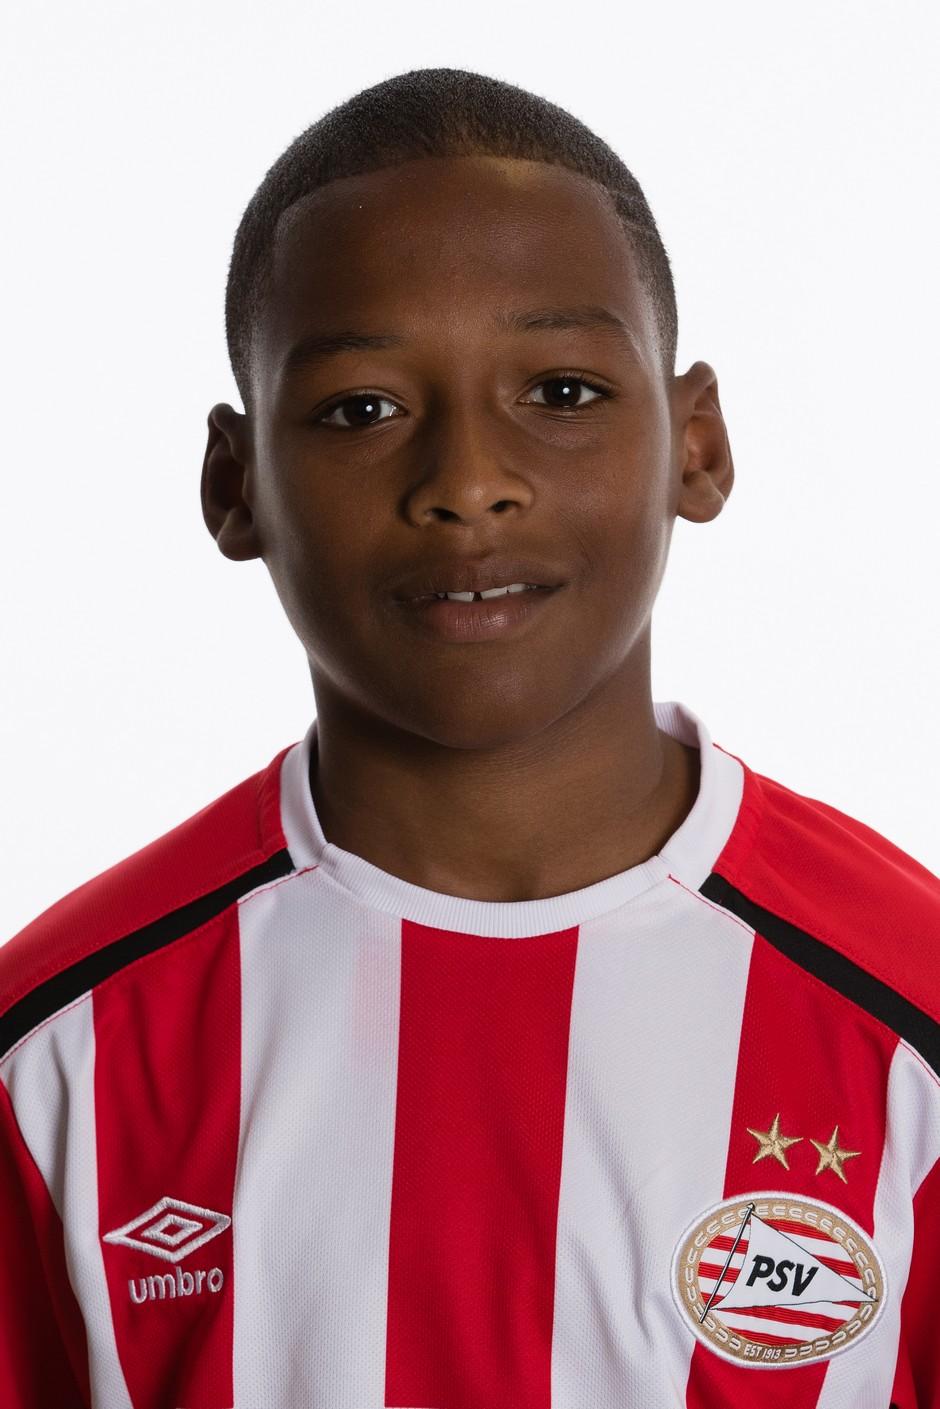 PSV O13 - 2016-2017